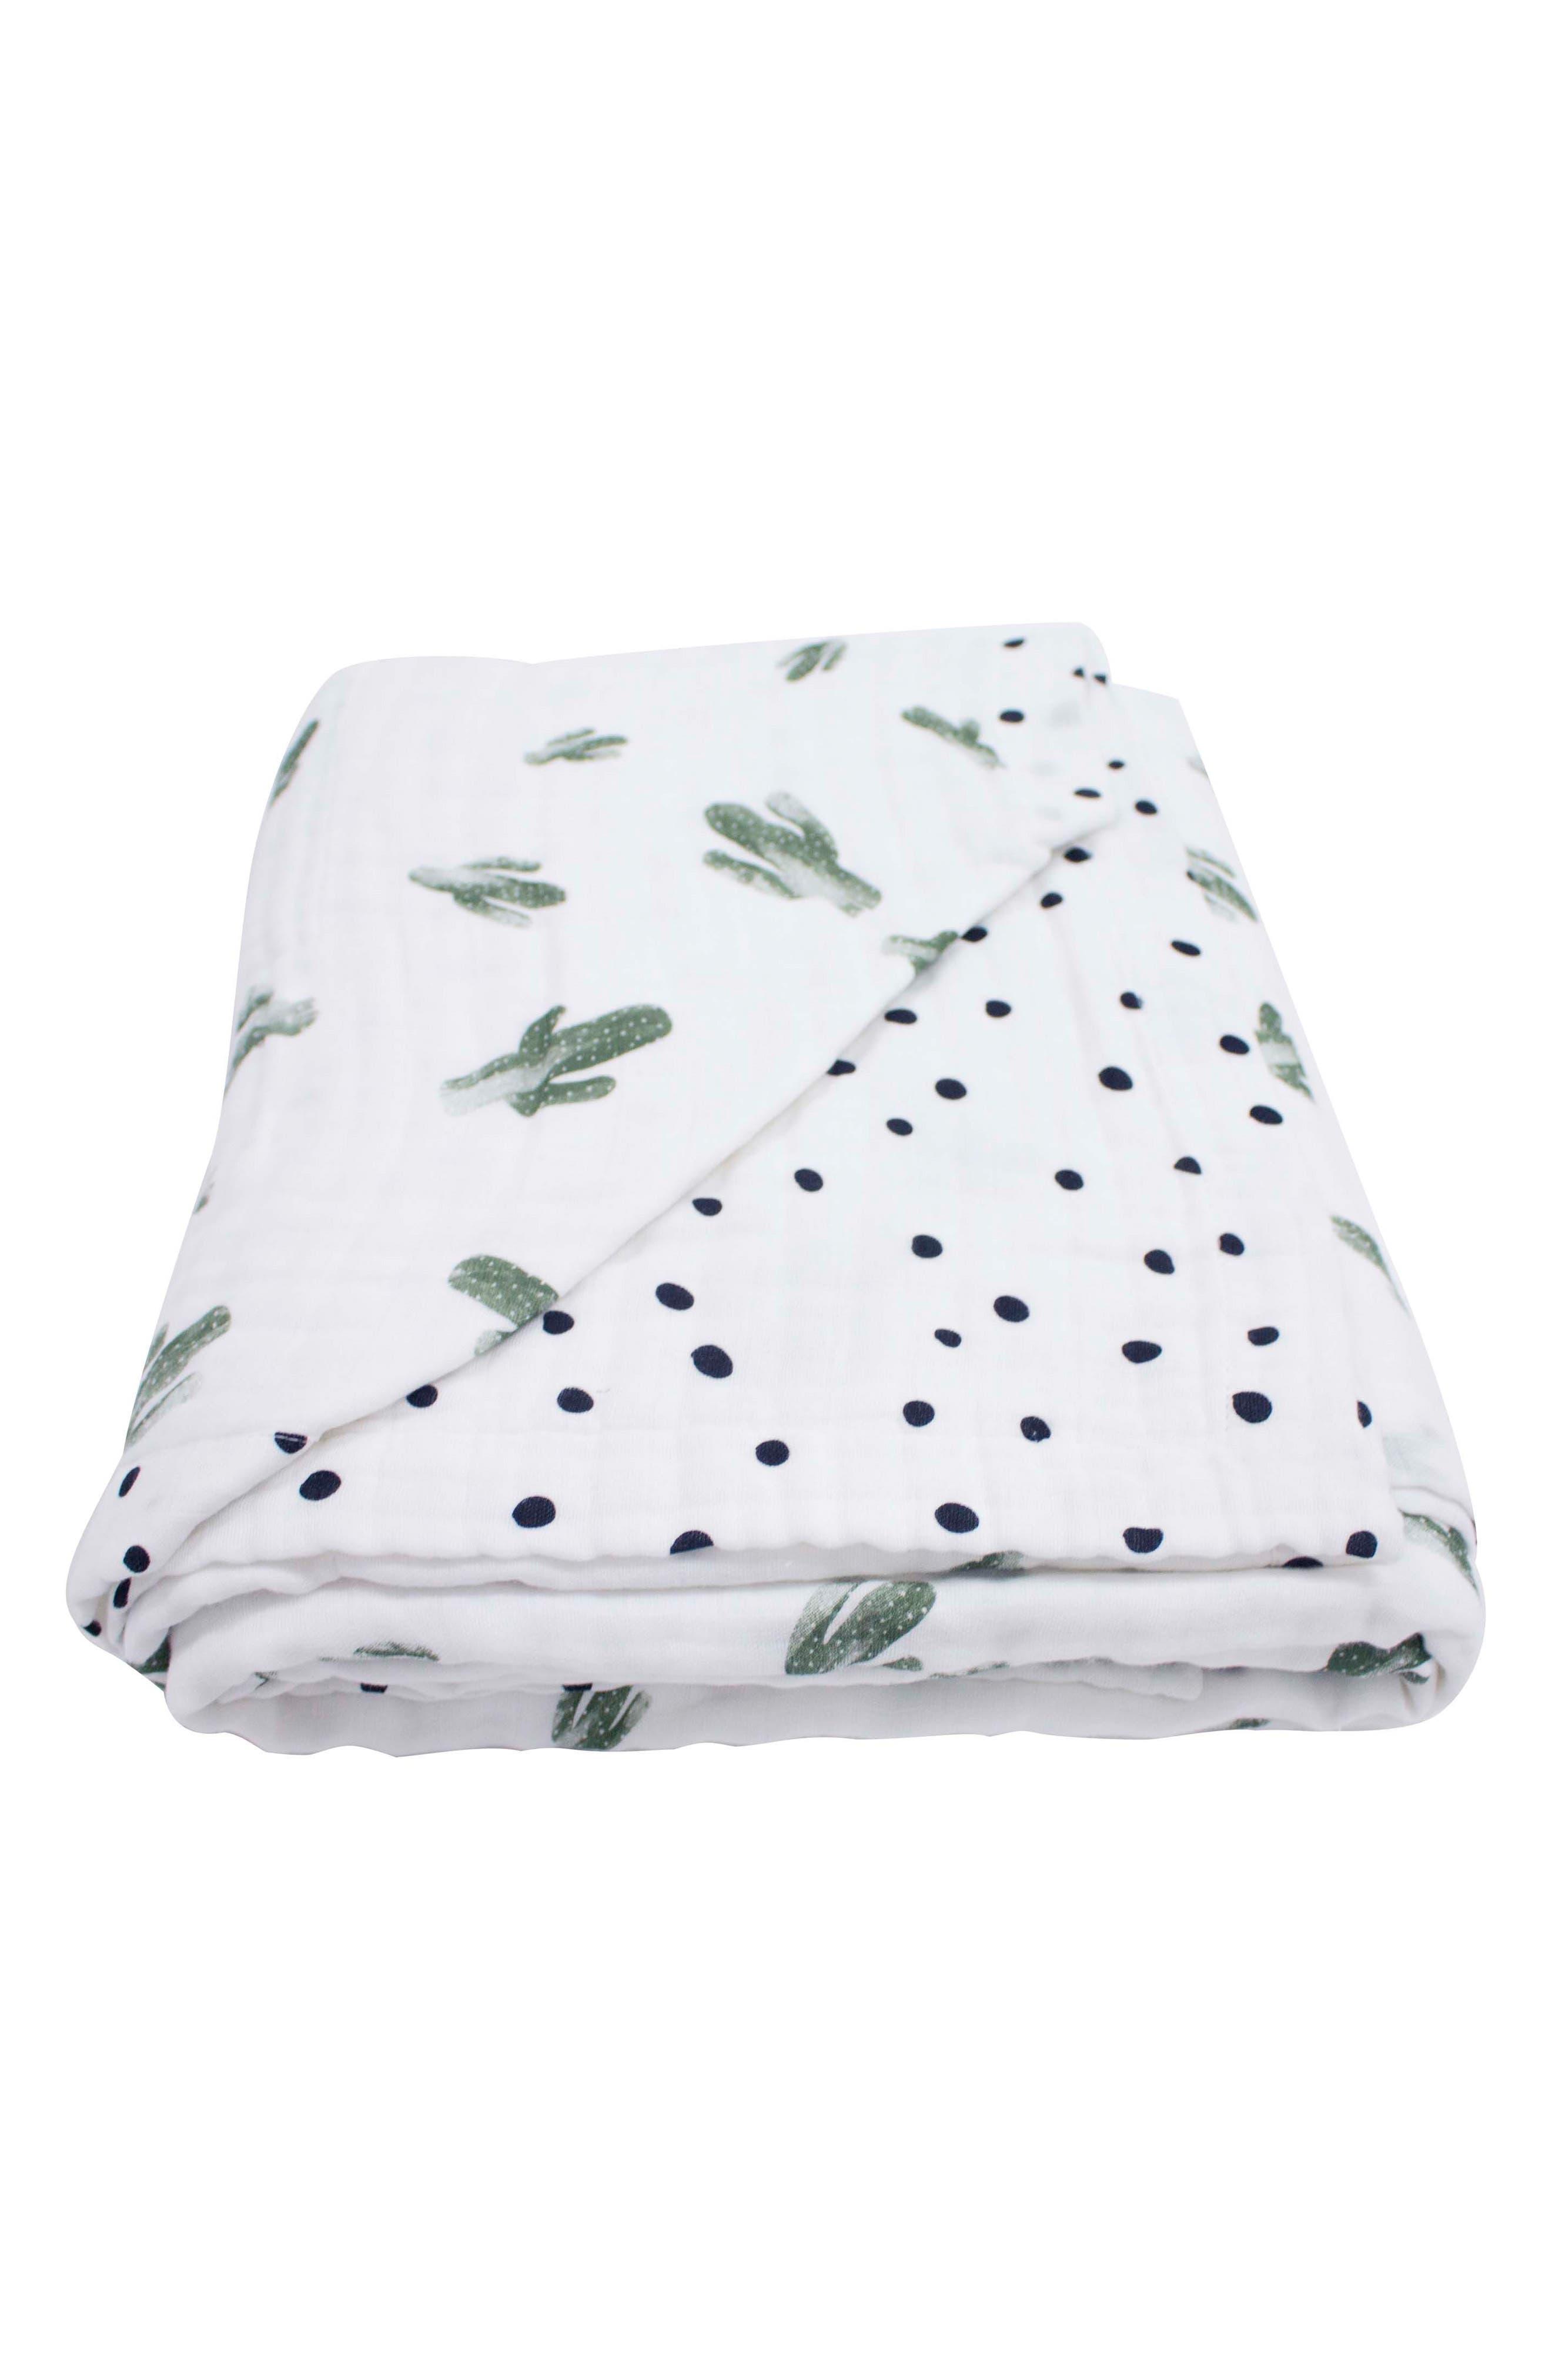 Oh So Soft Super Snuggle Blanket,                         Main,                         color, SAGUARO/ DOTTIE